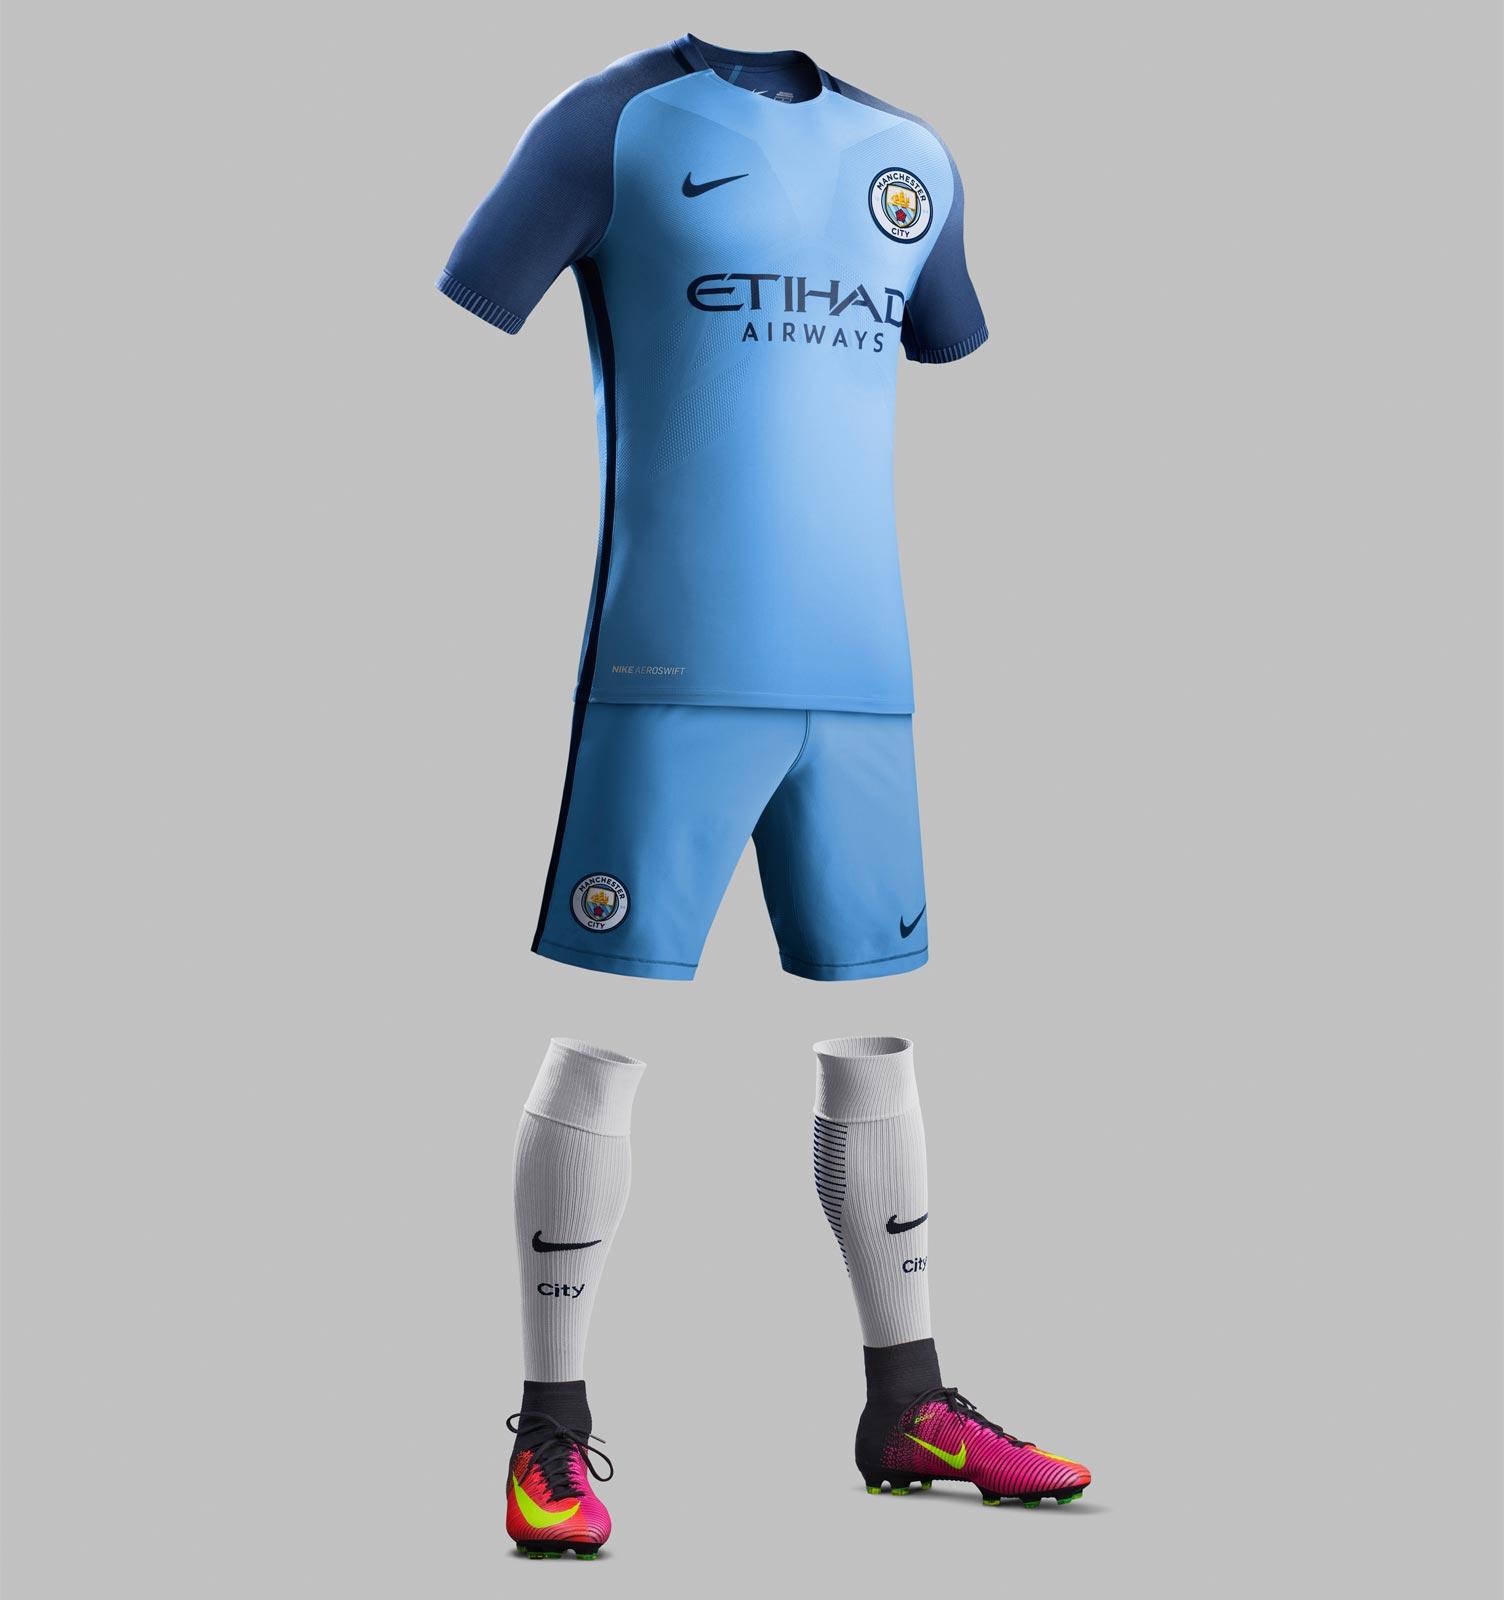 Tenue domicile 2016 - 2017 Manchester City